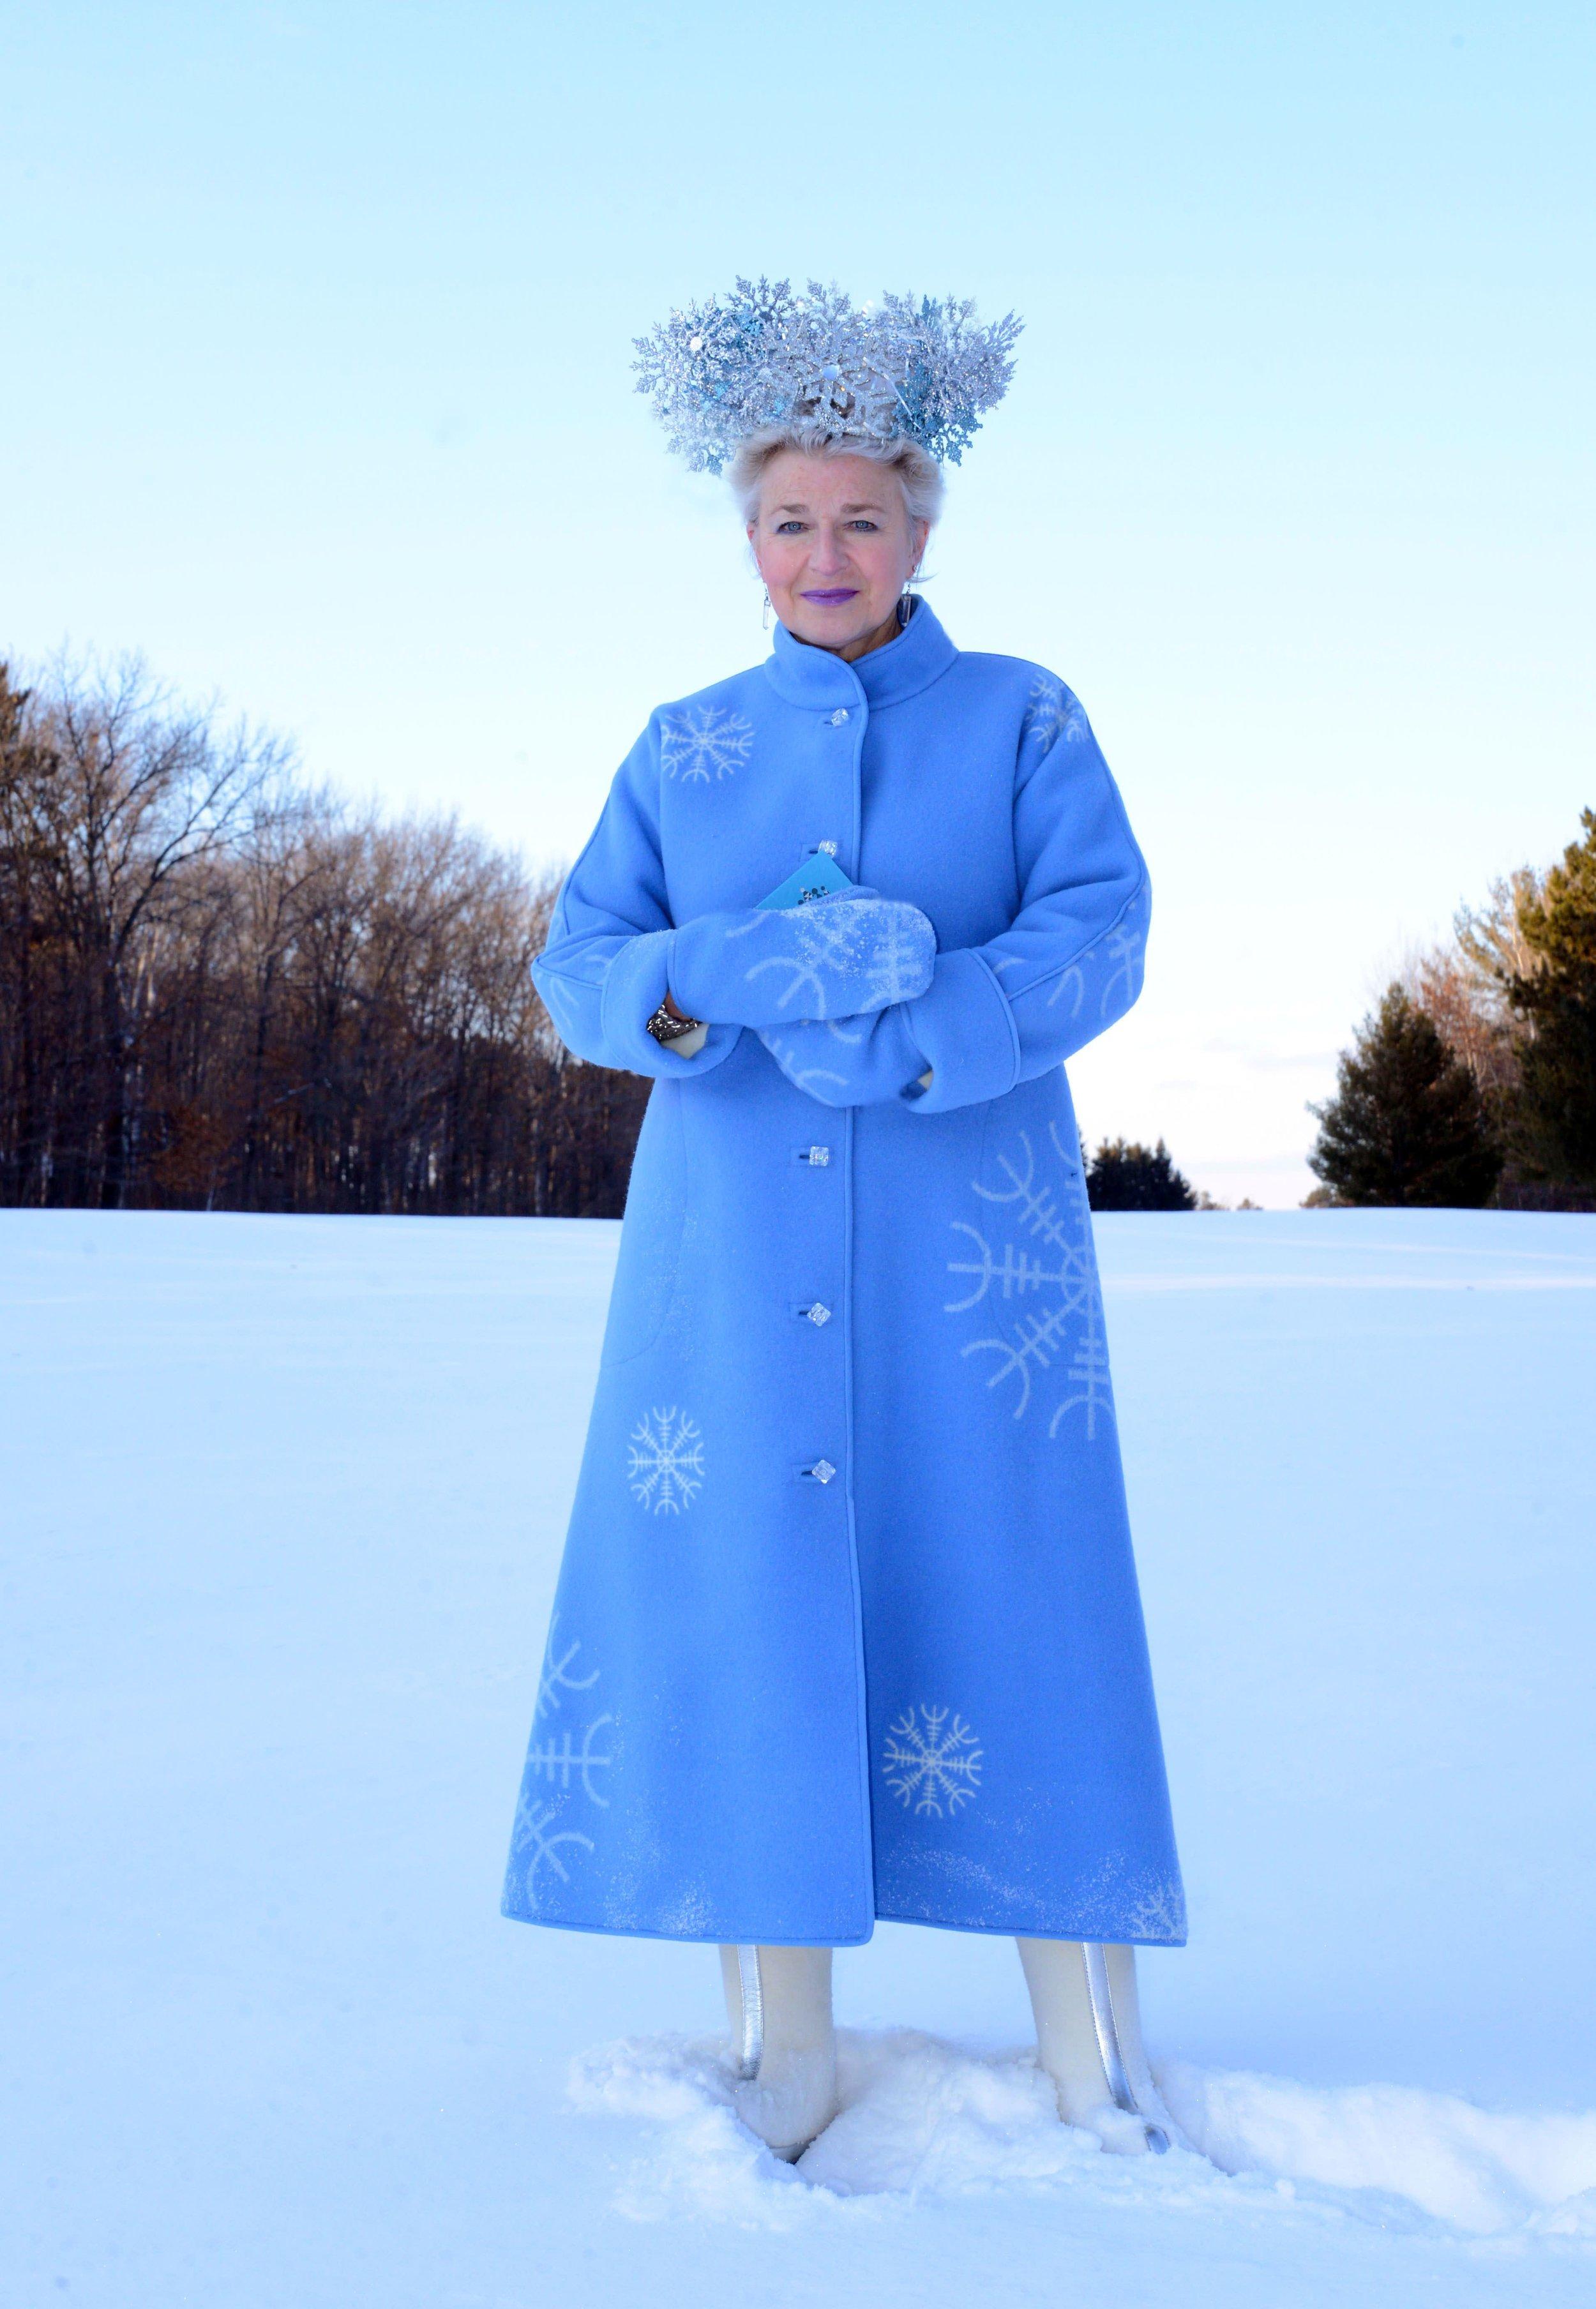 snow queen 1a2.jpg